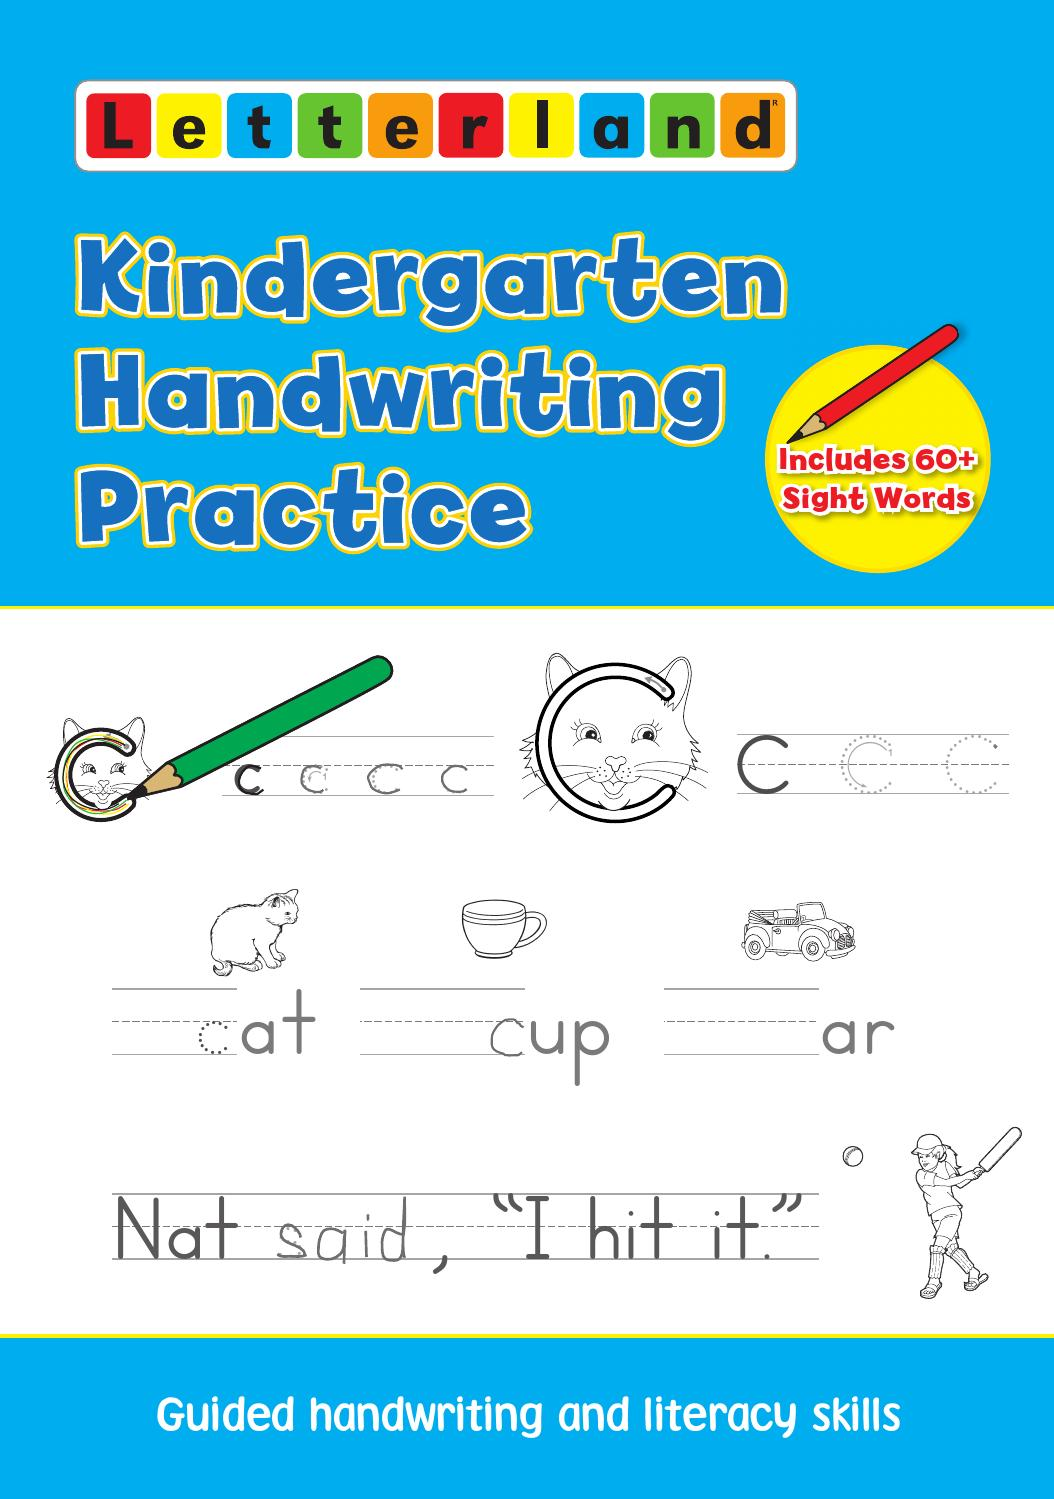 Kindergarten Handwriting Practice by Letterland - issuu